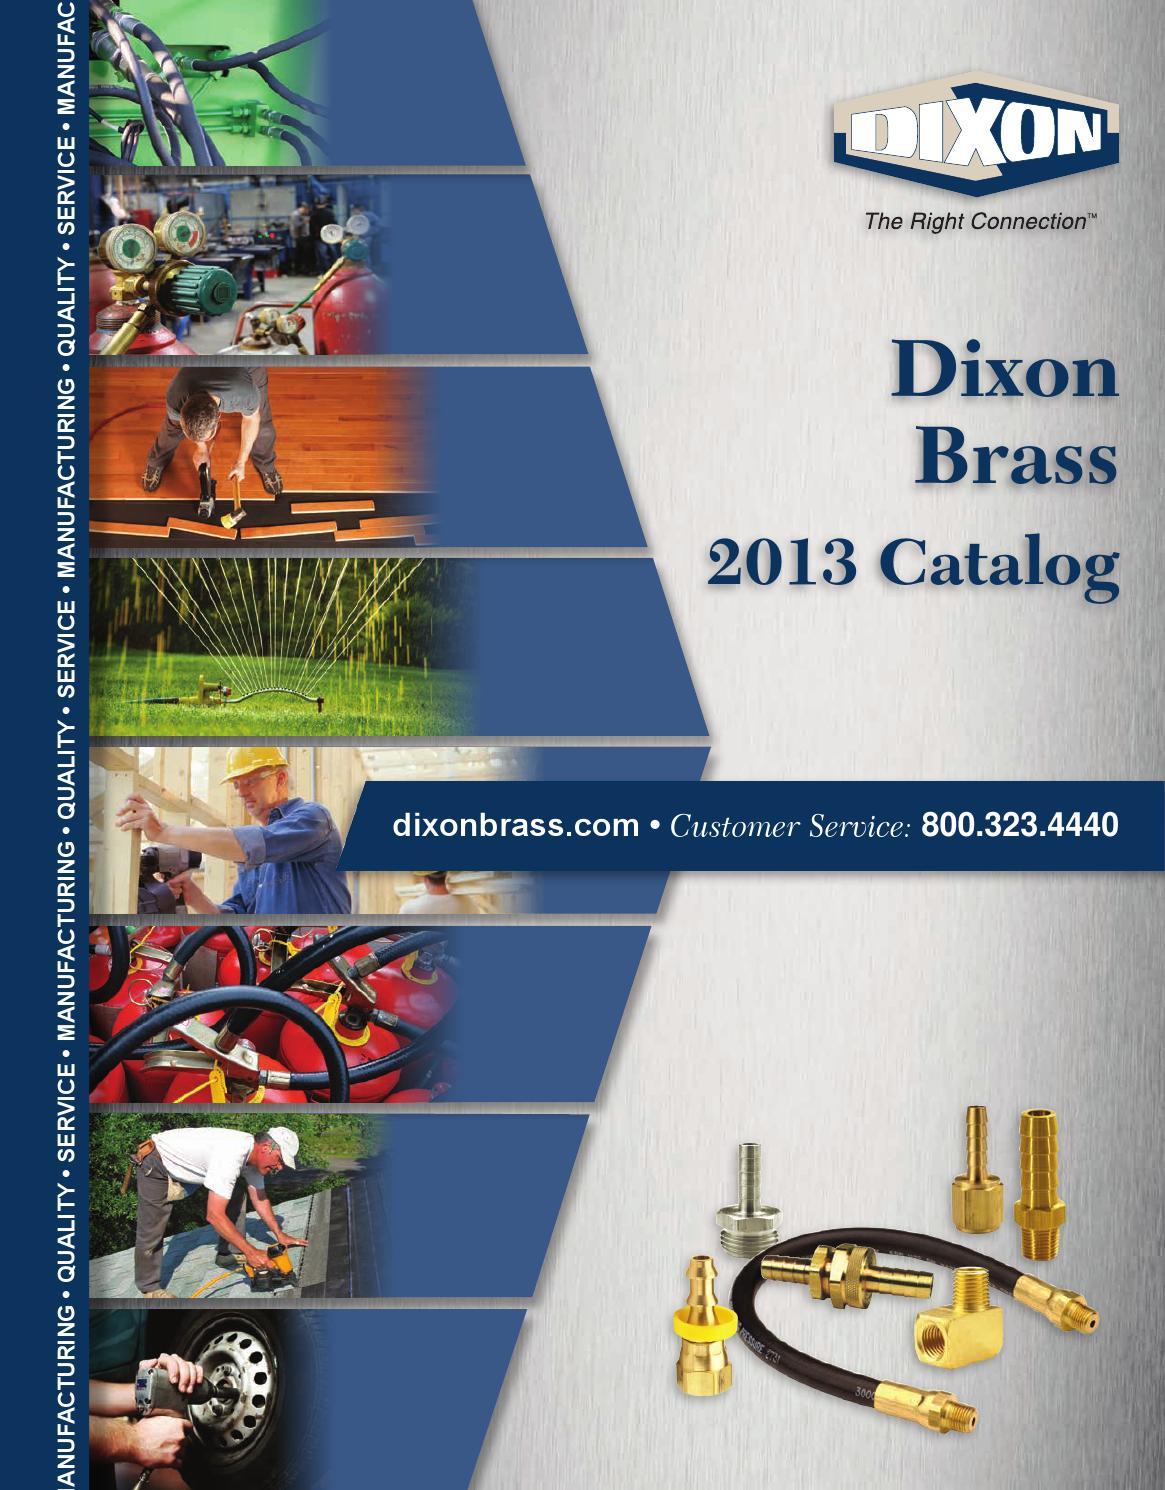 Dixon 3260202C 1//8 Male NPTF x 1//8 Fem NPTF Brass Extruded Street Tee